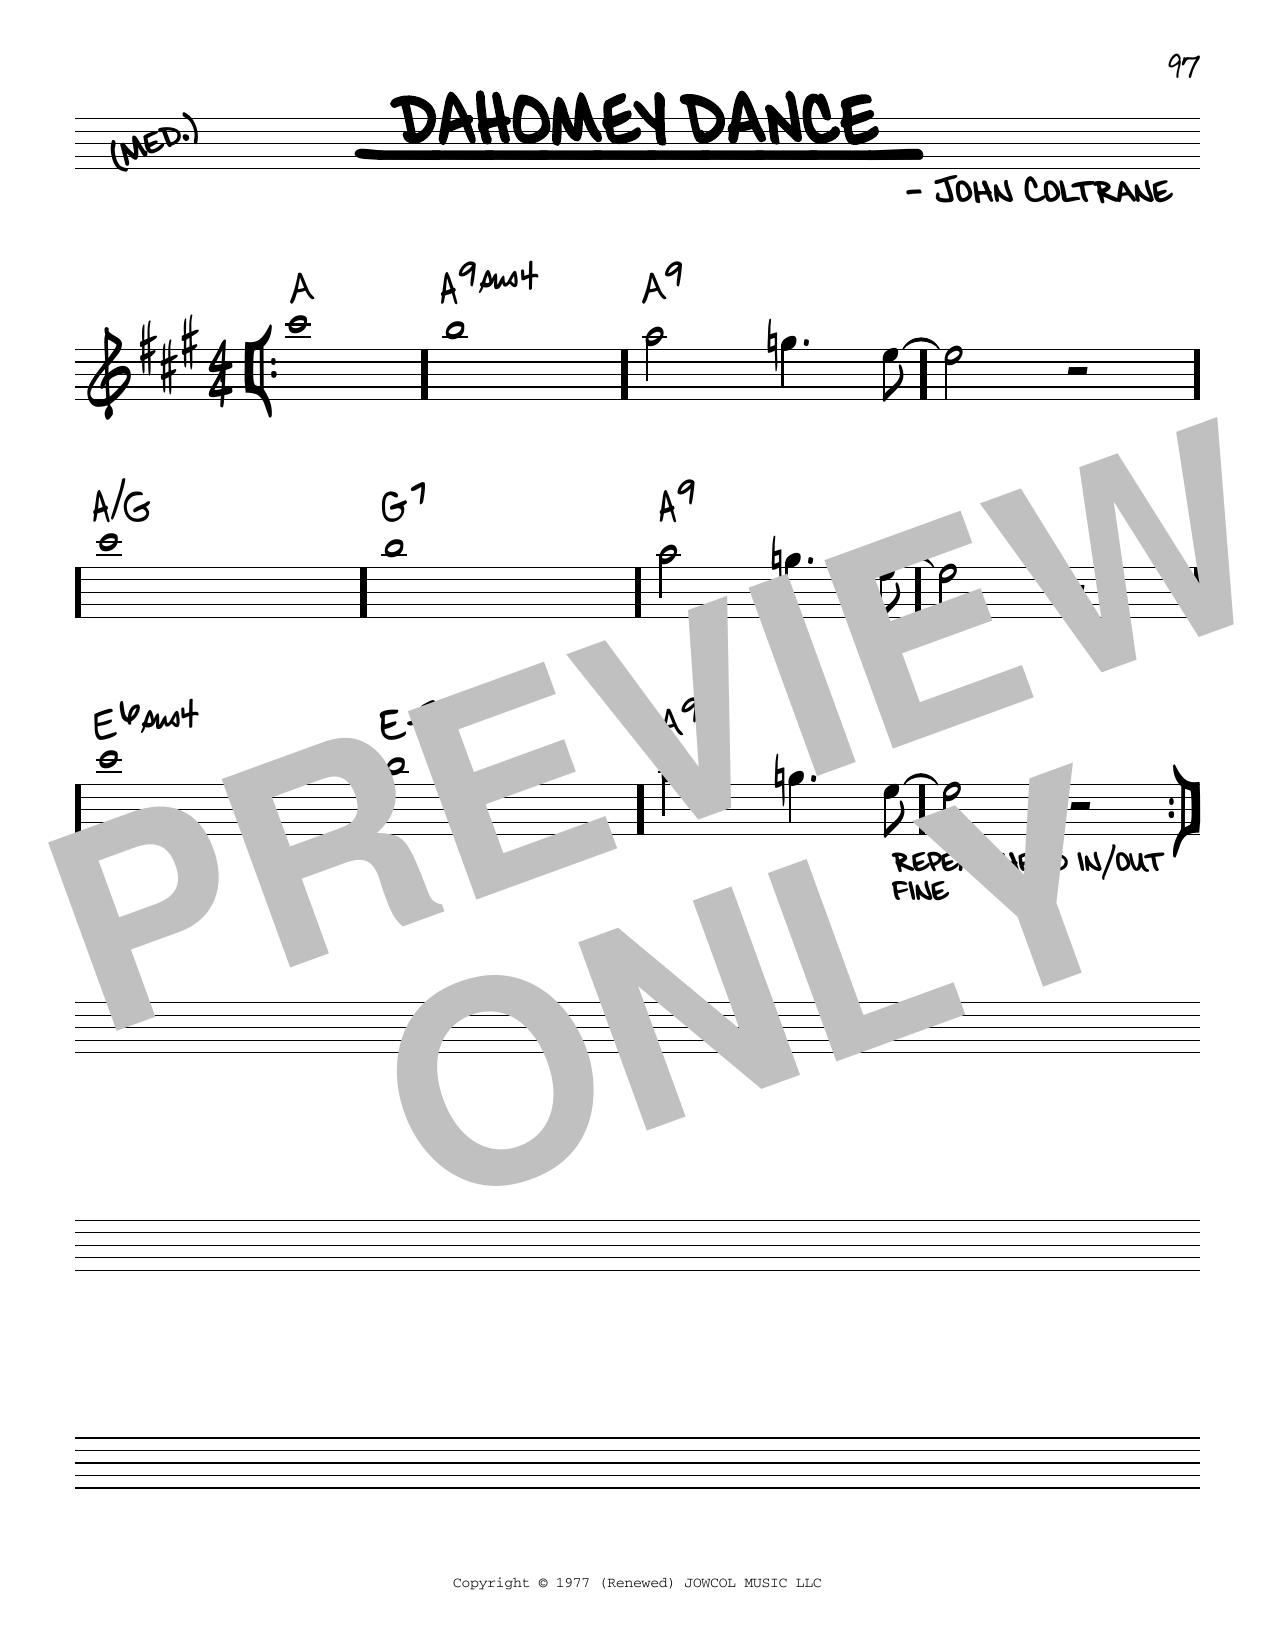 John Coltrane Dahomey Dance sheet music notes and chords. Download Printable PDF.